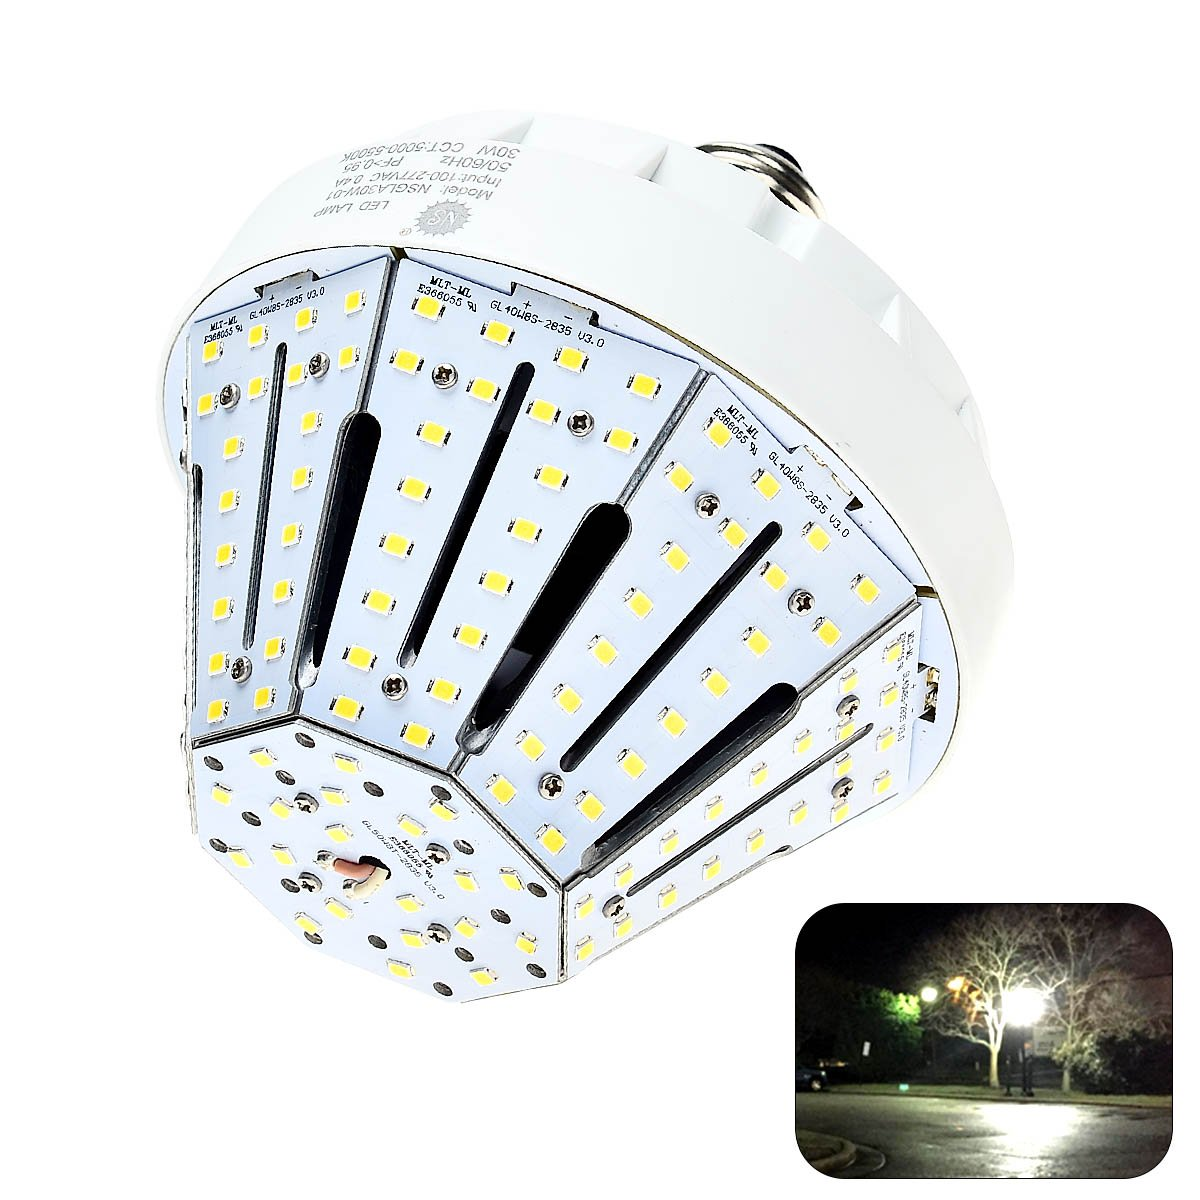 Phenas 30W LED Corn Light Bulbs E26 Base 5500 Lumens 6000K for Street Area Light, Parking Lot, Post Lighting, Gymnasium,Warehouse, Subway, Porch, Backyard, Garden Super Bright